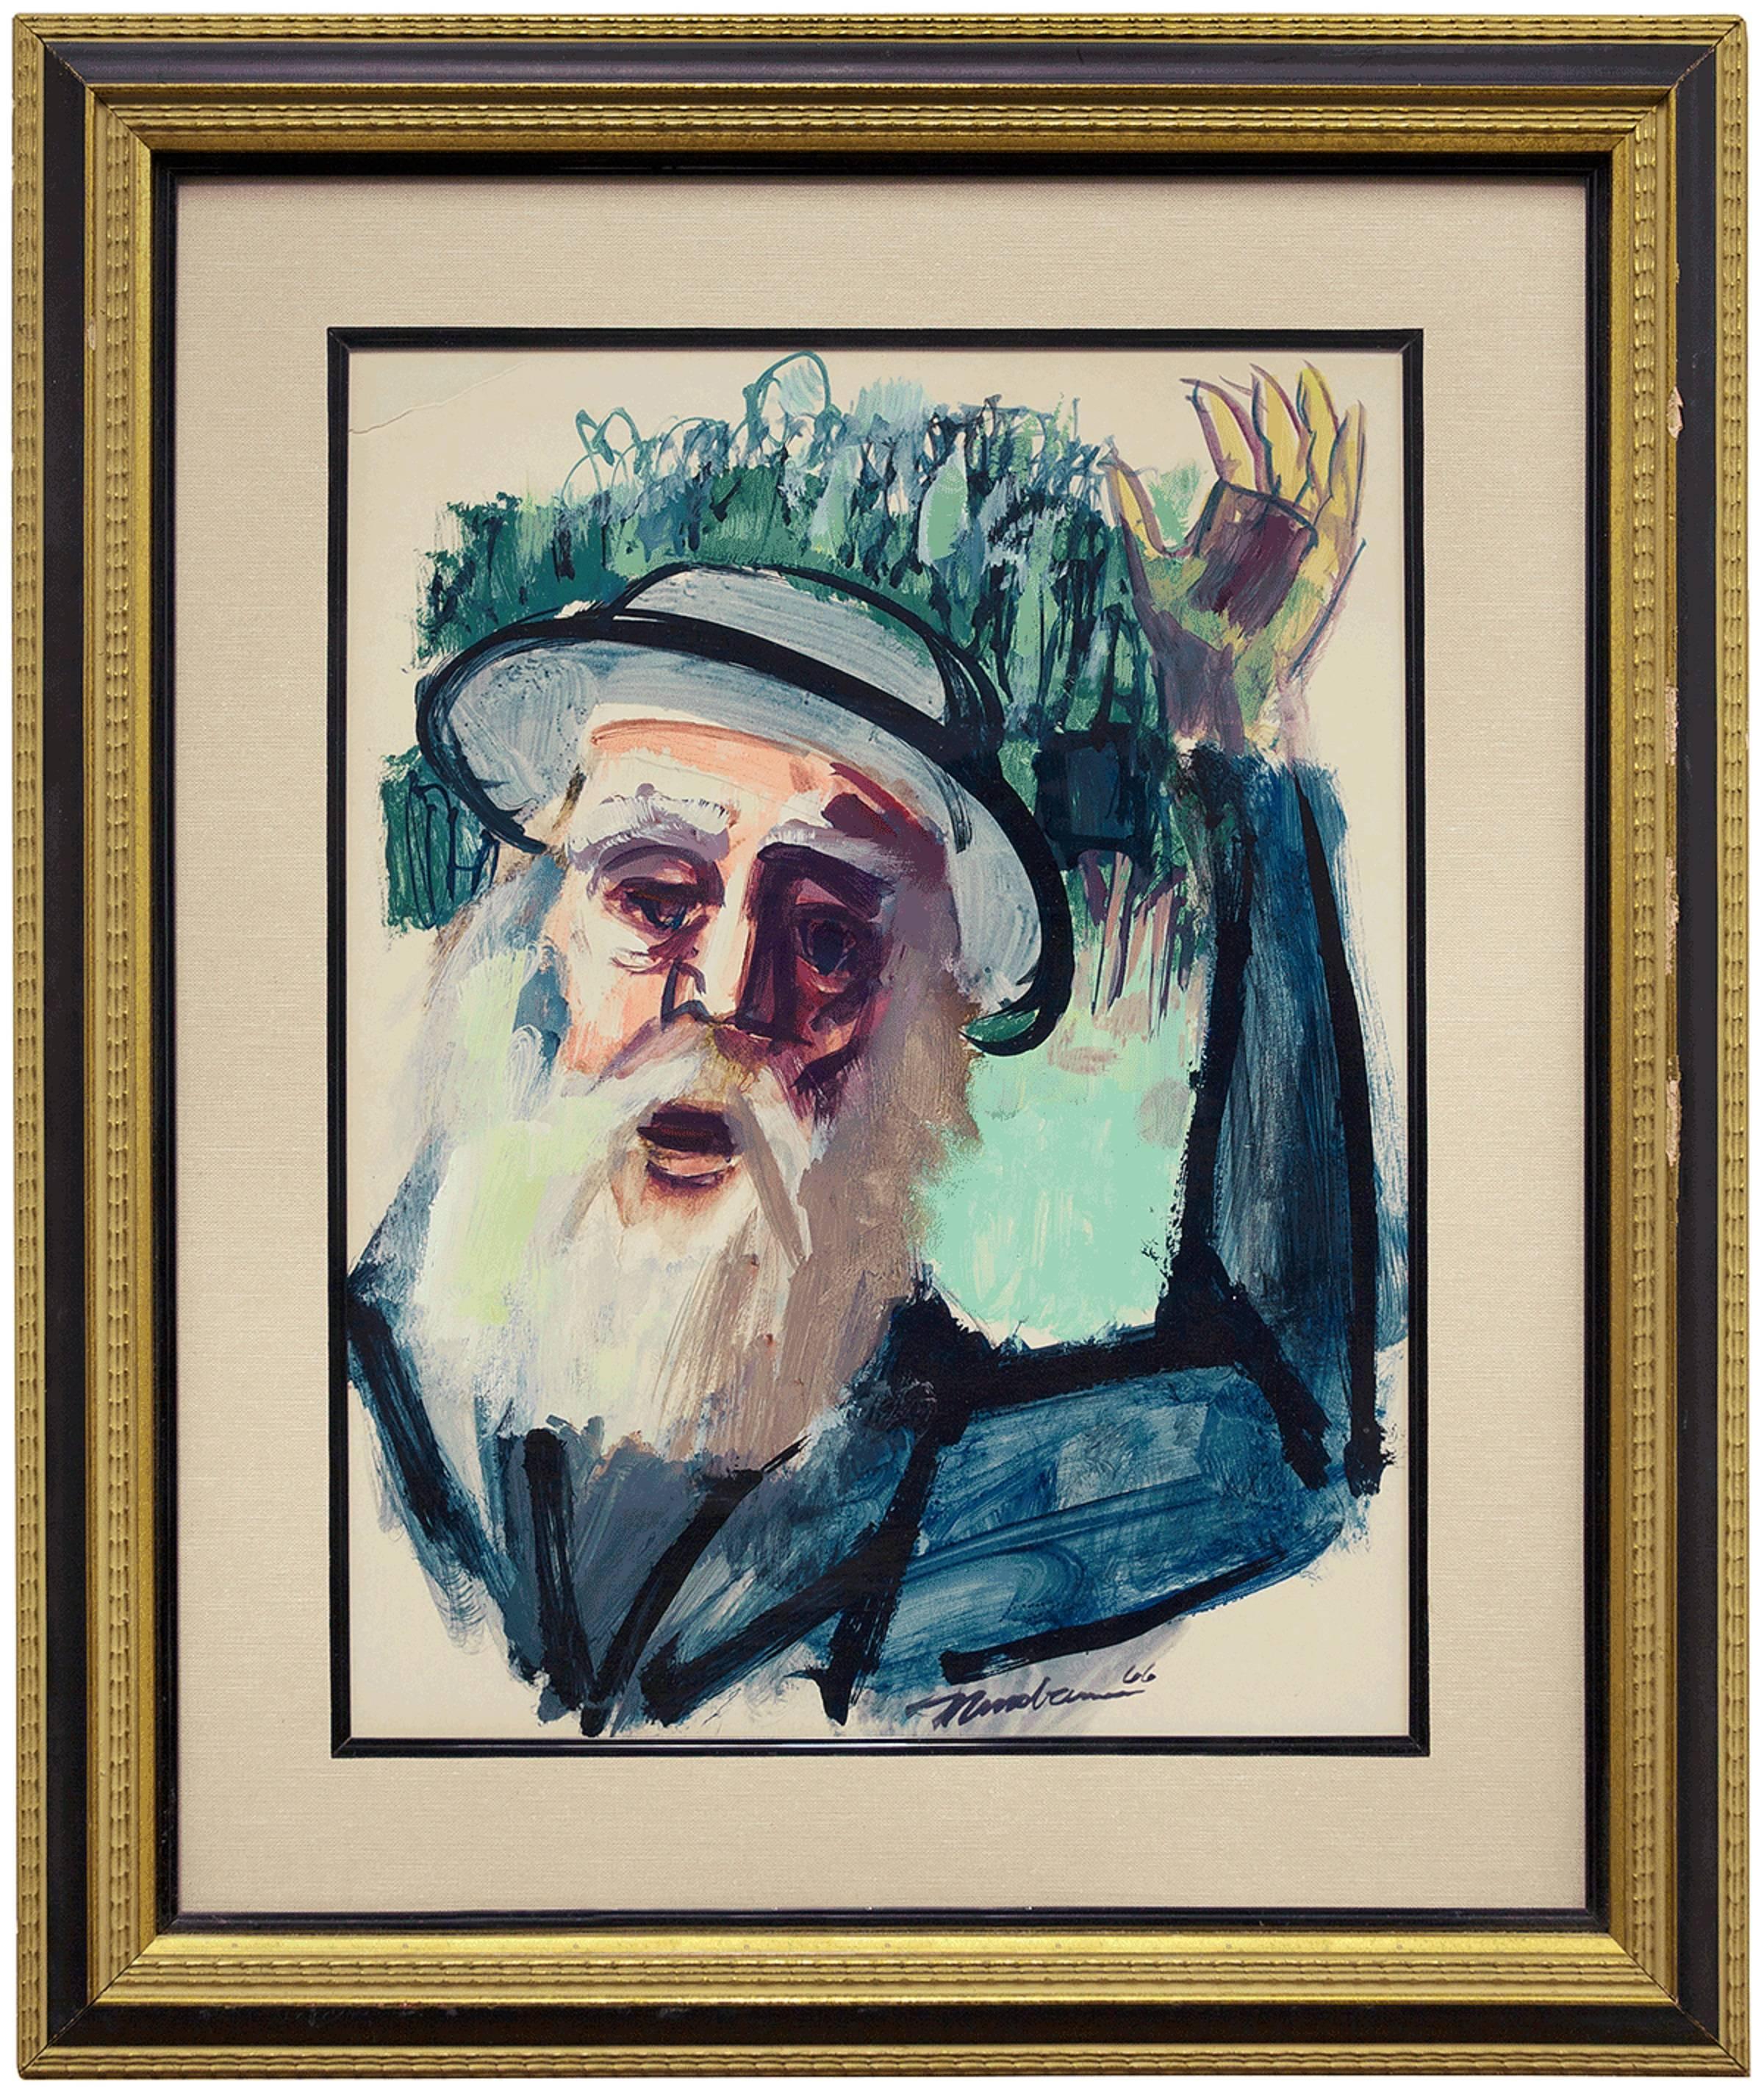 Chassidic Rabbi, Judaica Expressionist Painting